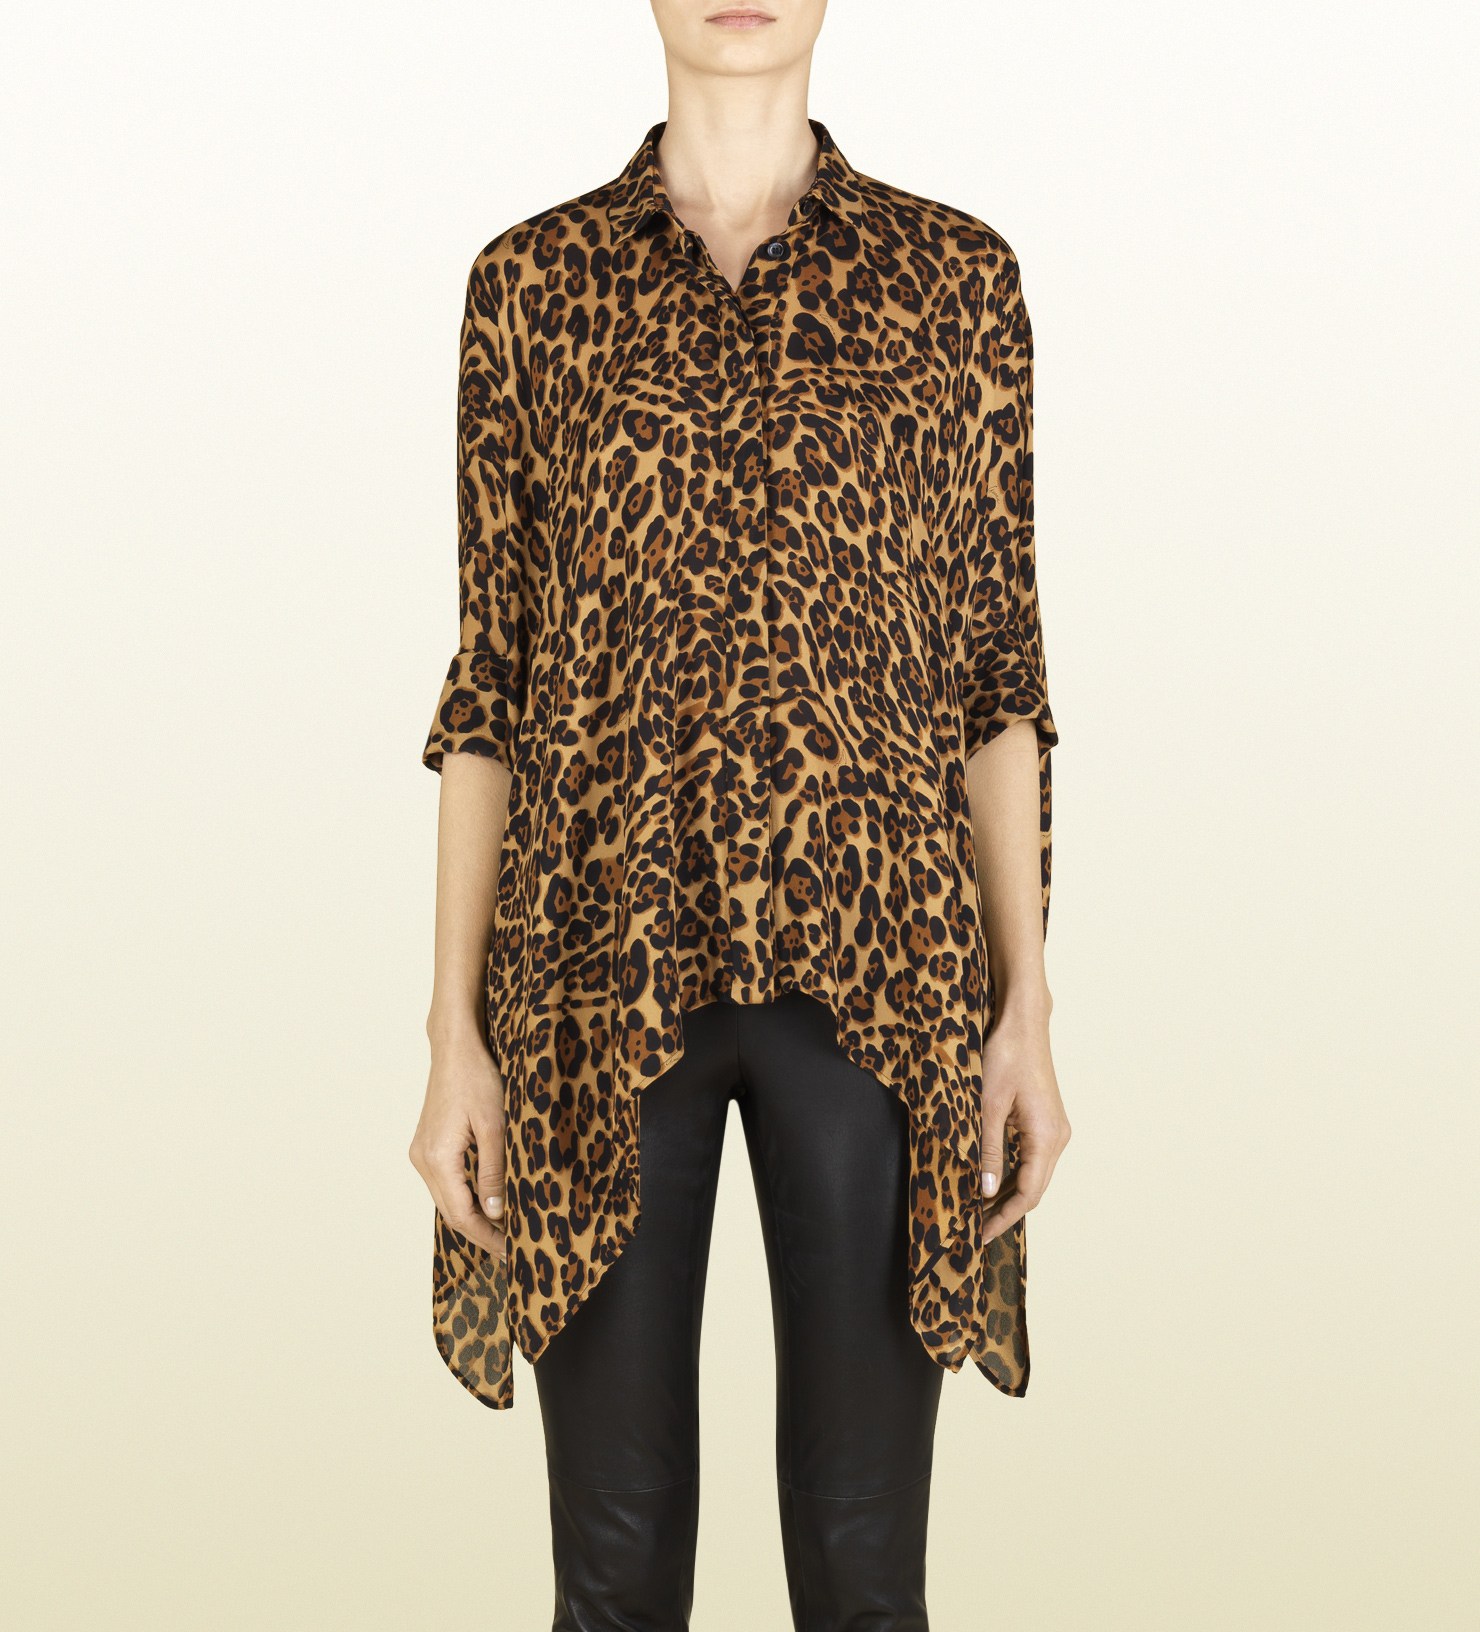 Jaguar Clothing Accessories: Gucci Jaguar Print Silk Cape Shirt In Animal (jaguar)